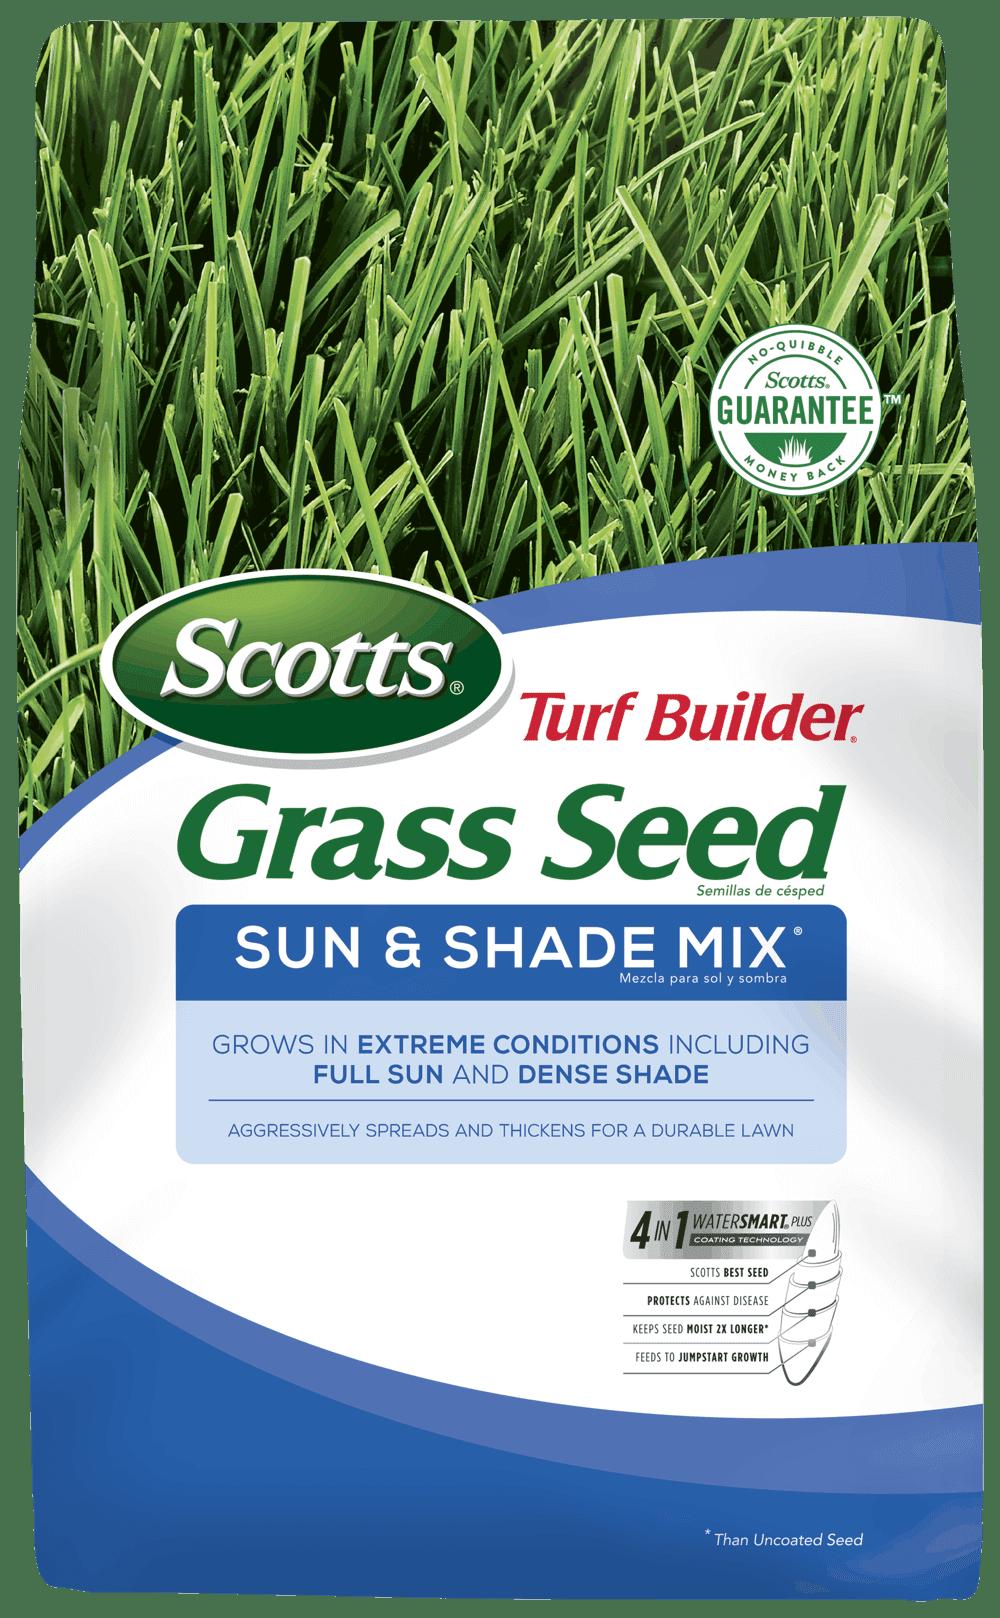 Turf Builder Sun & Shade Mix